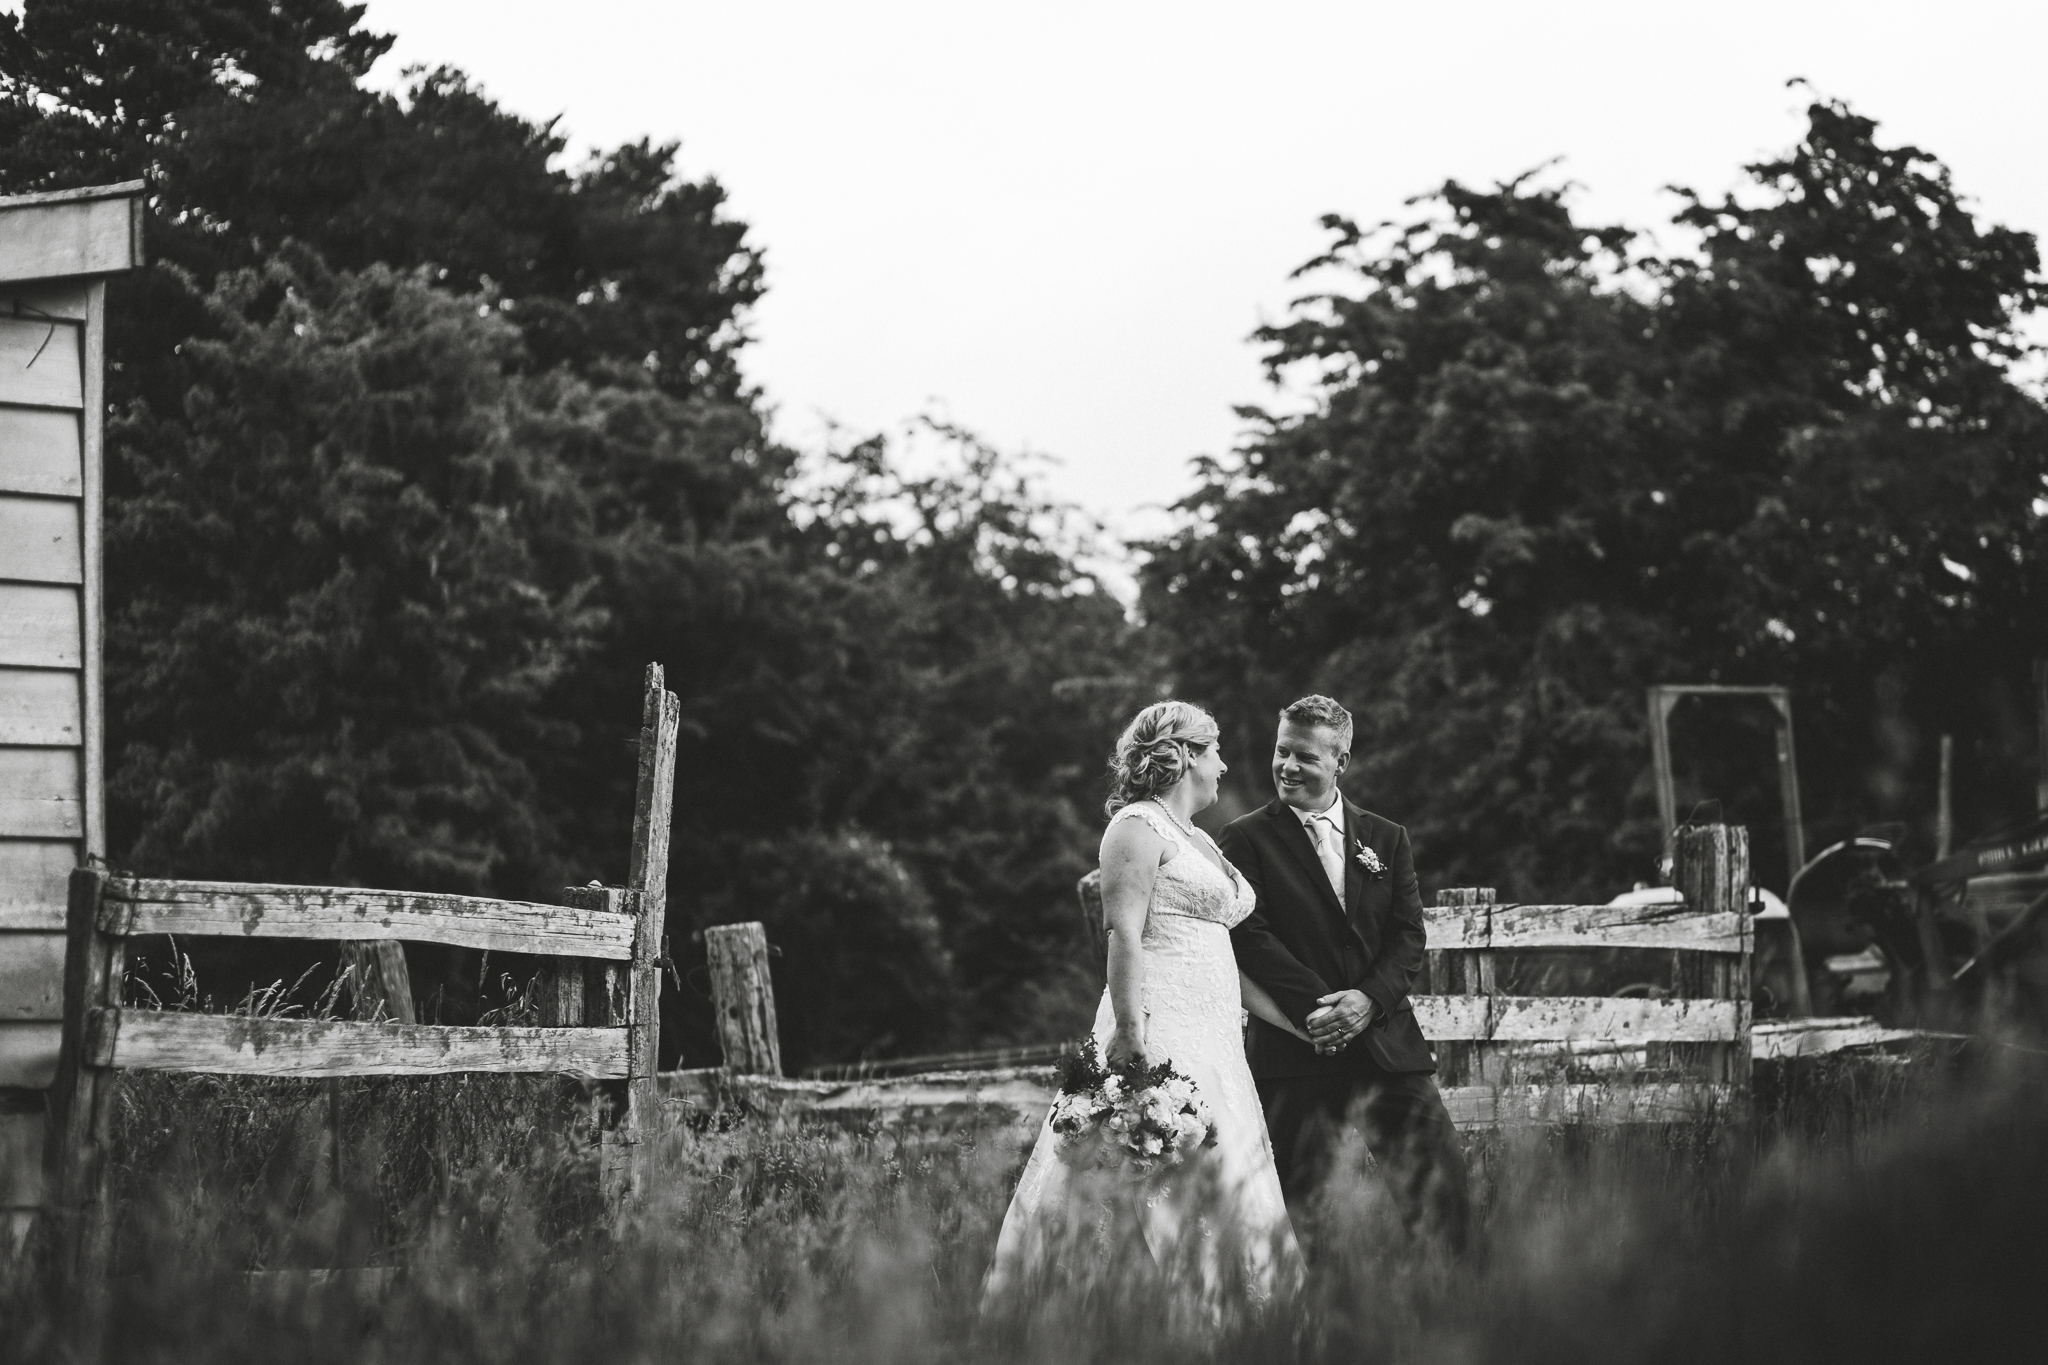 Lisa Fisher Photography gwavas homestead hawkebay-32.jpg